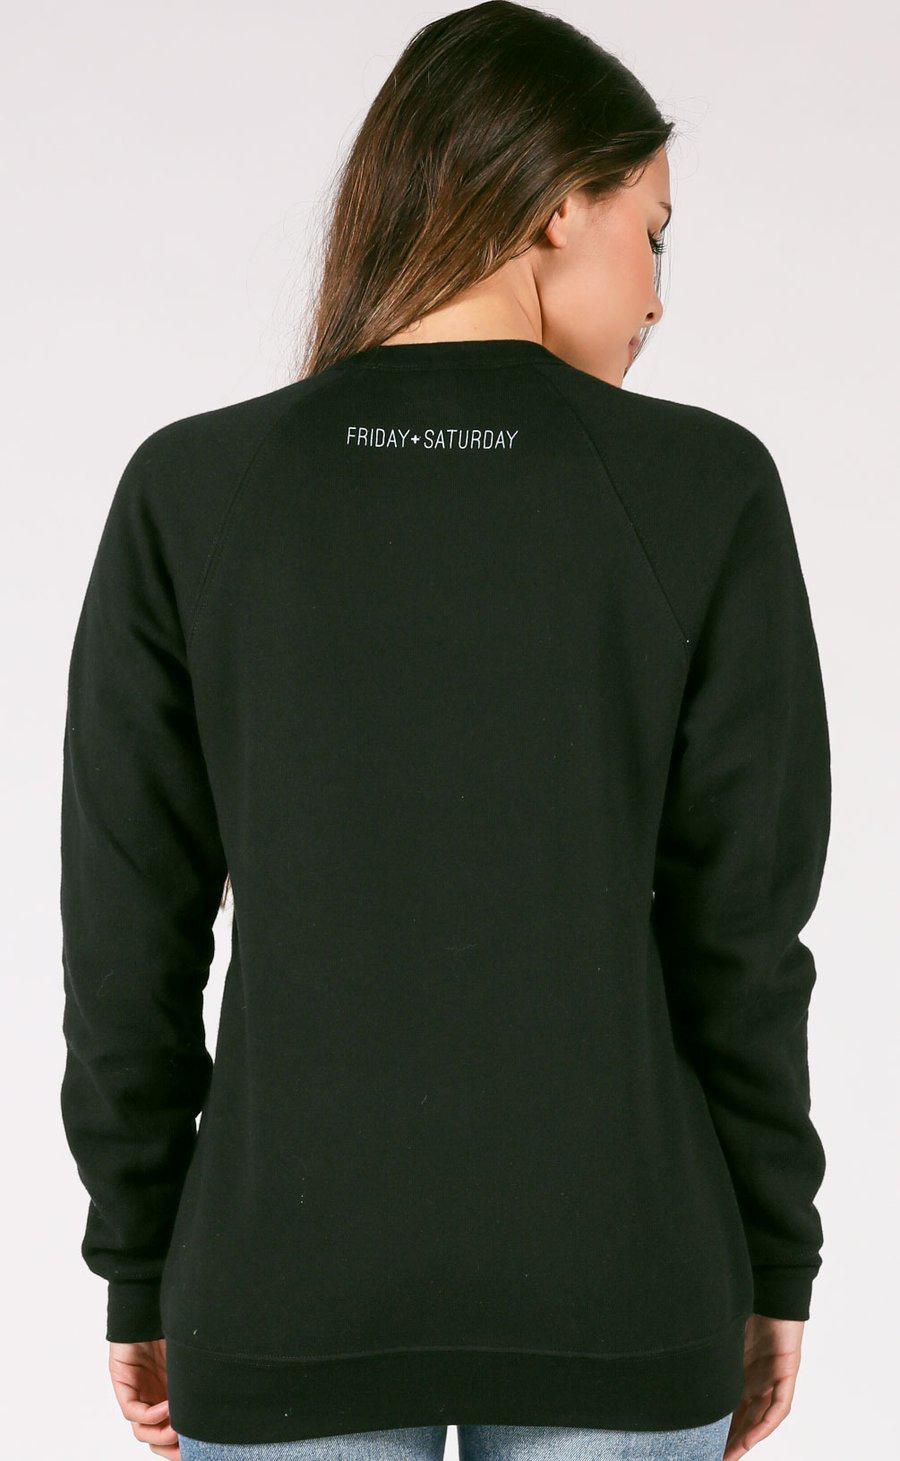 Sweatshirt Babes Support Babes Sweatshirt, Black, Small